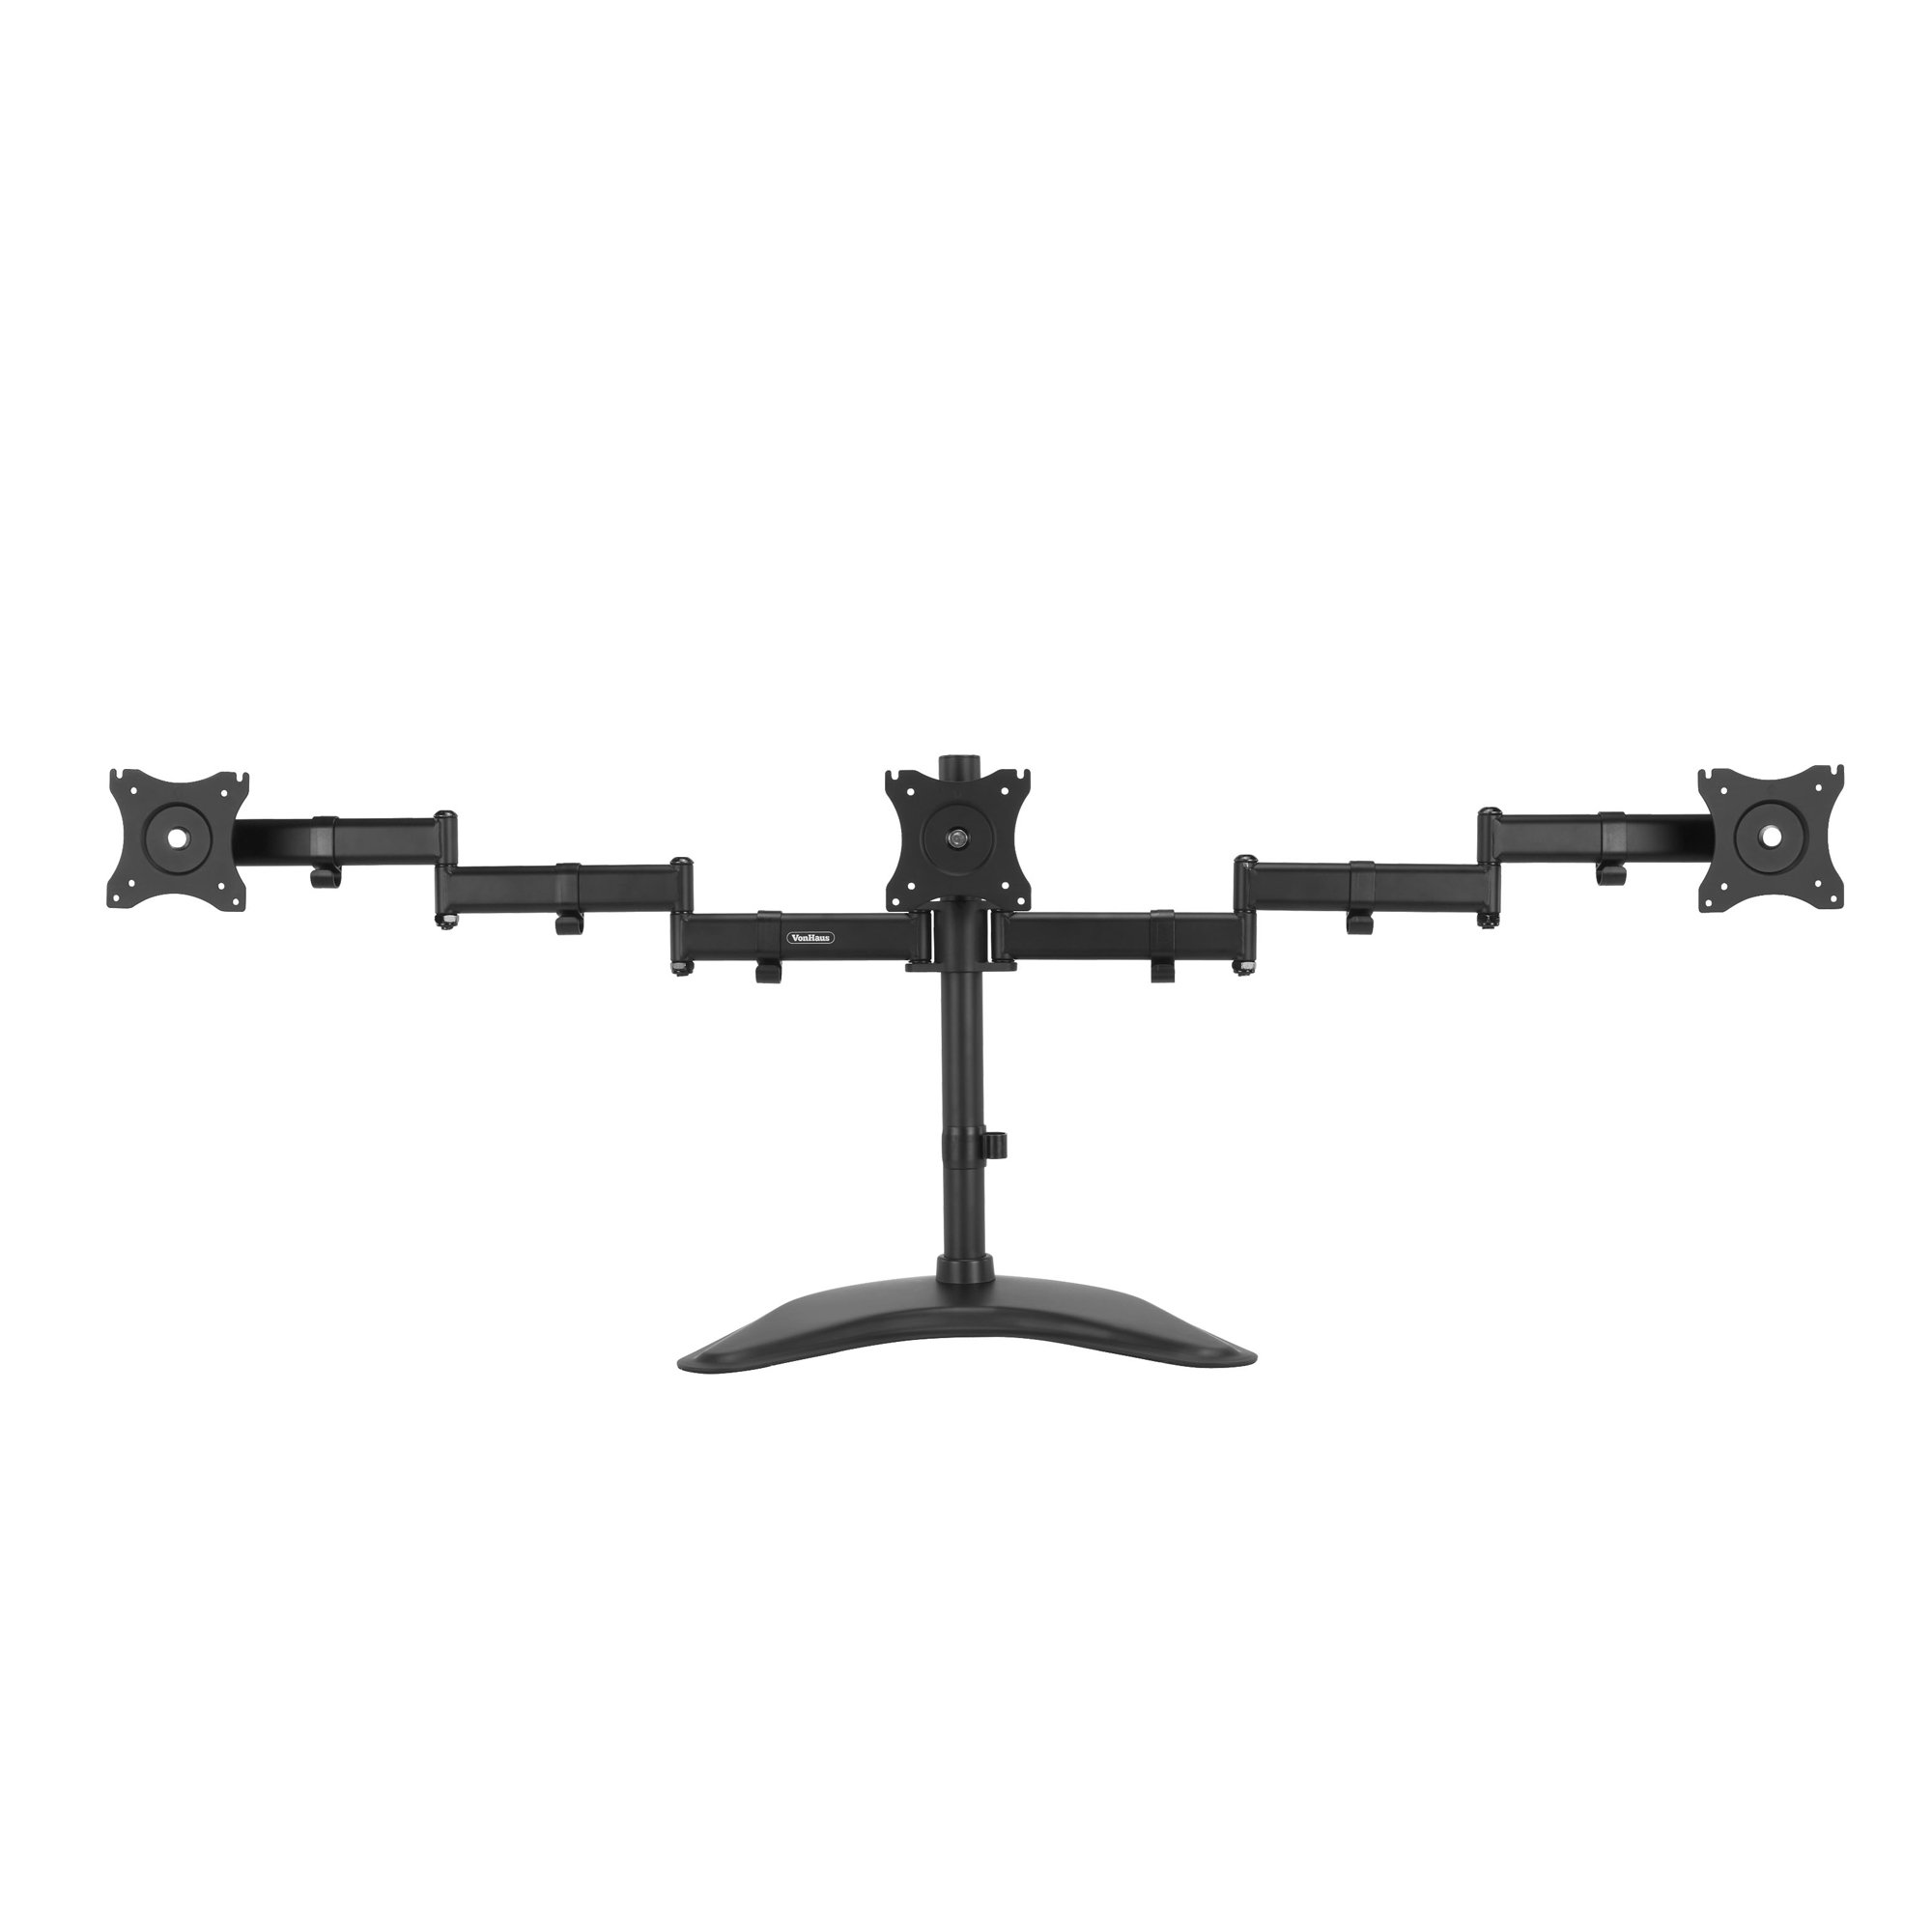 "VonHaus Triple Monitor Stand for 13-27"" Screens - Three Arm Desk Mount Bracket - Ergonomic 90° Tilt, 360° Rotation & 360° Swivel Arms - VESA Dimensions: 75x75-100x100"